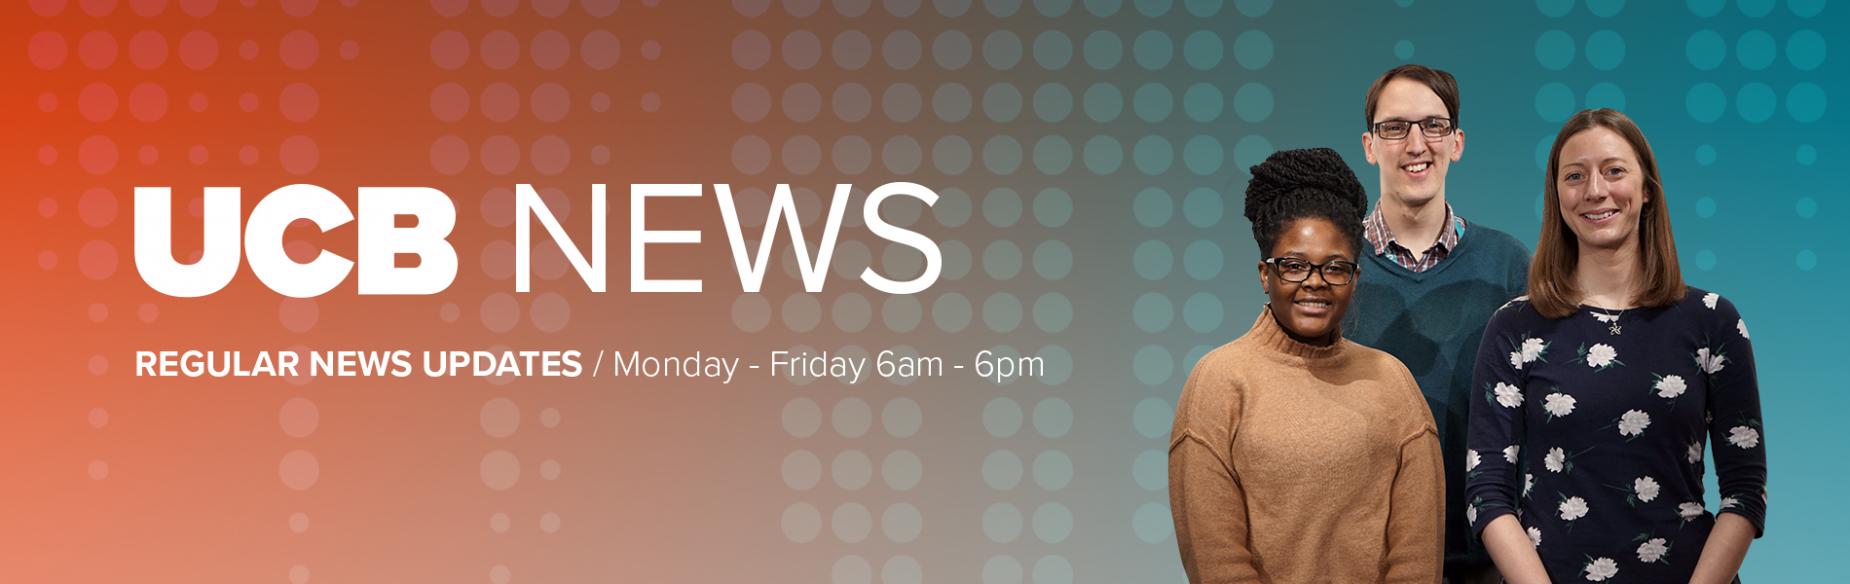 UCB News Regular news updates / Monday - Friday 6am - 6pm